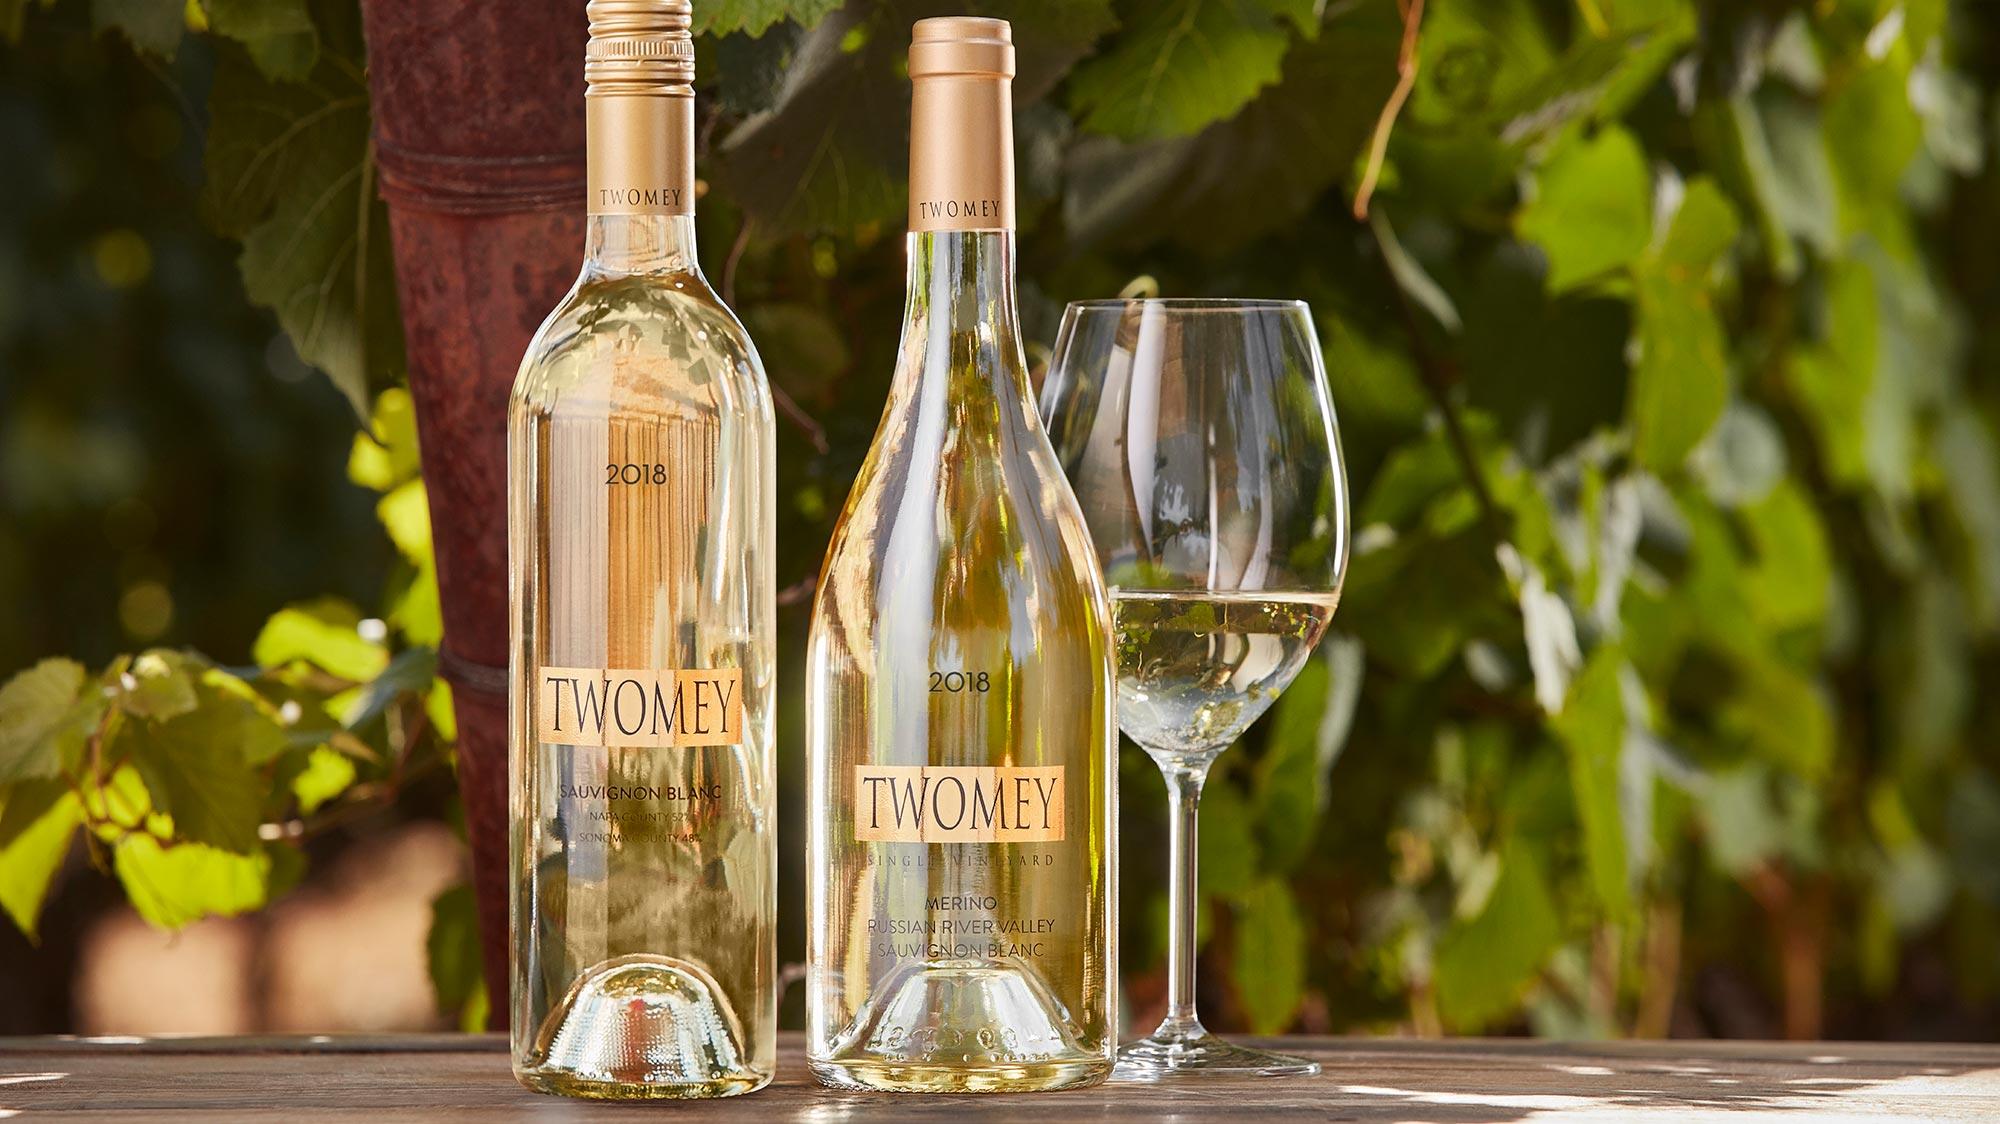 Twomey Sauvignon Blanc